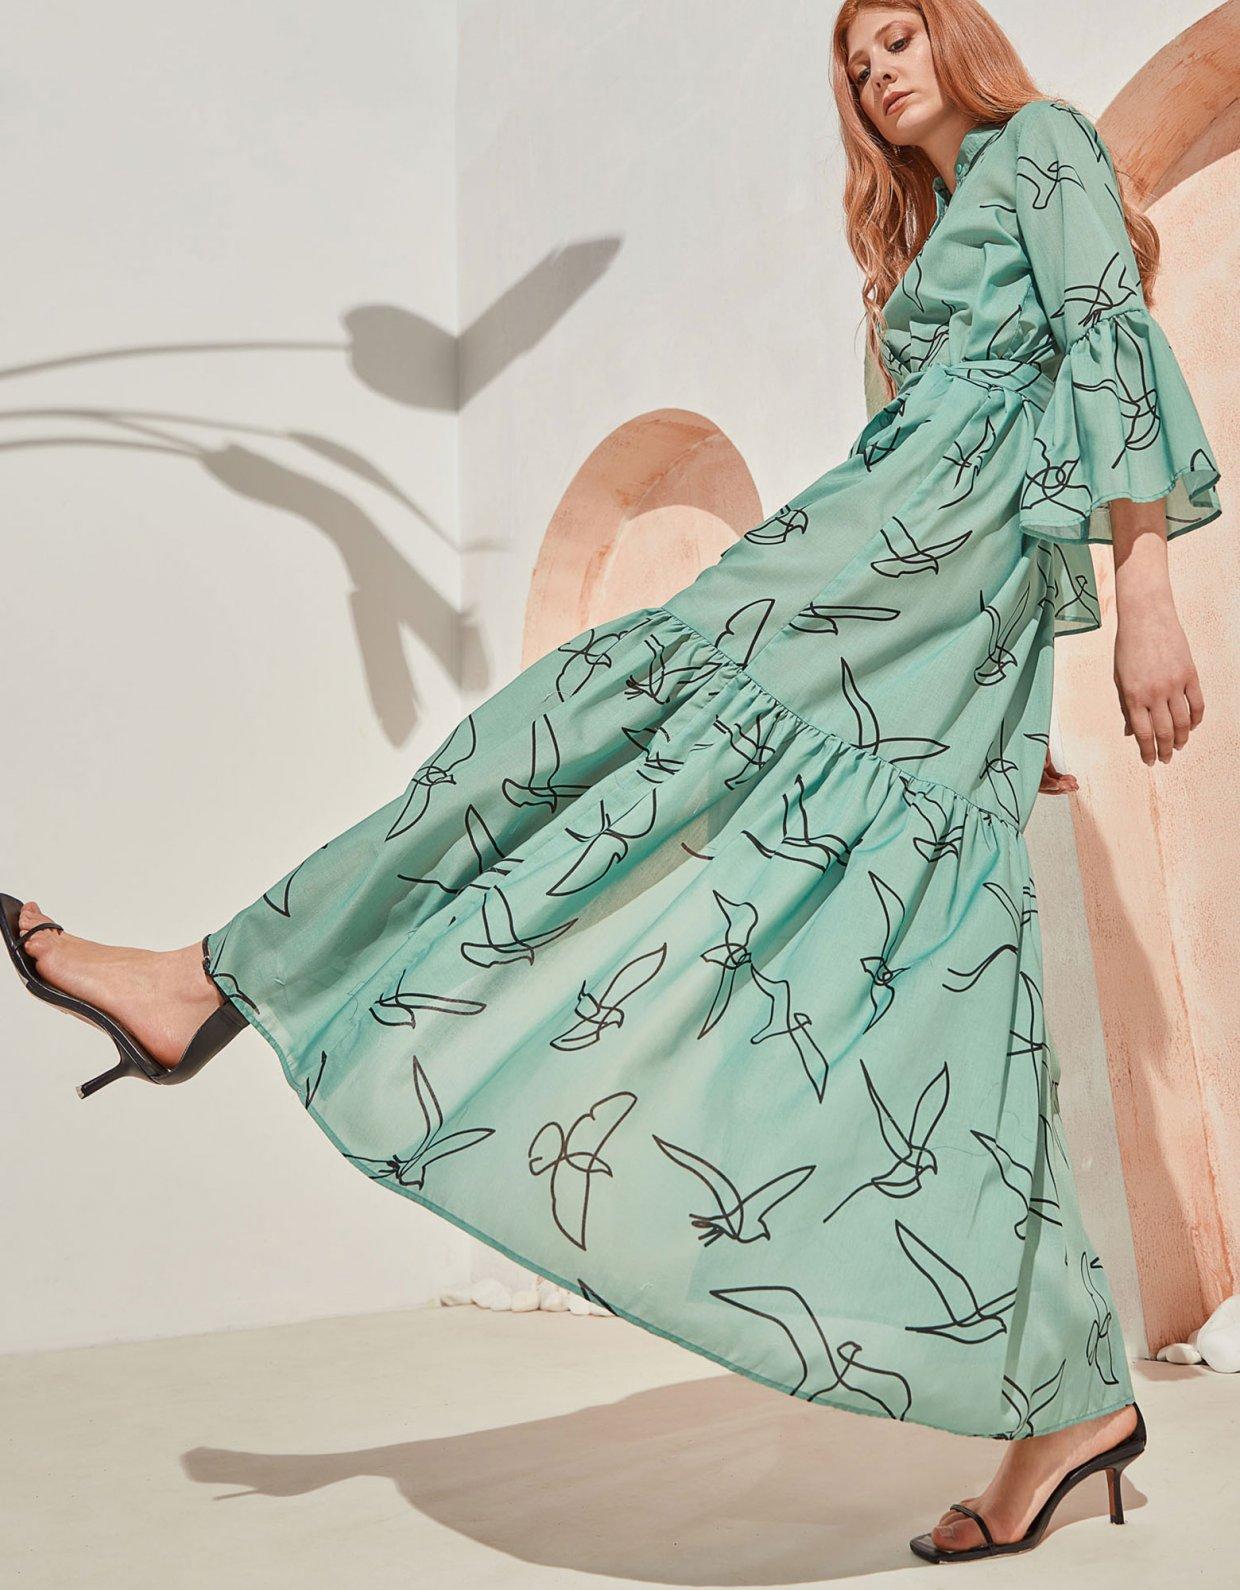 The Knl's Sway maxi dress mint birds